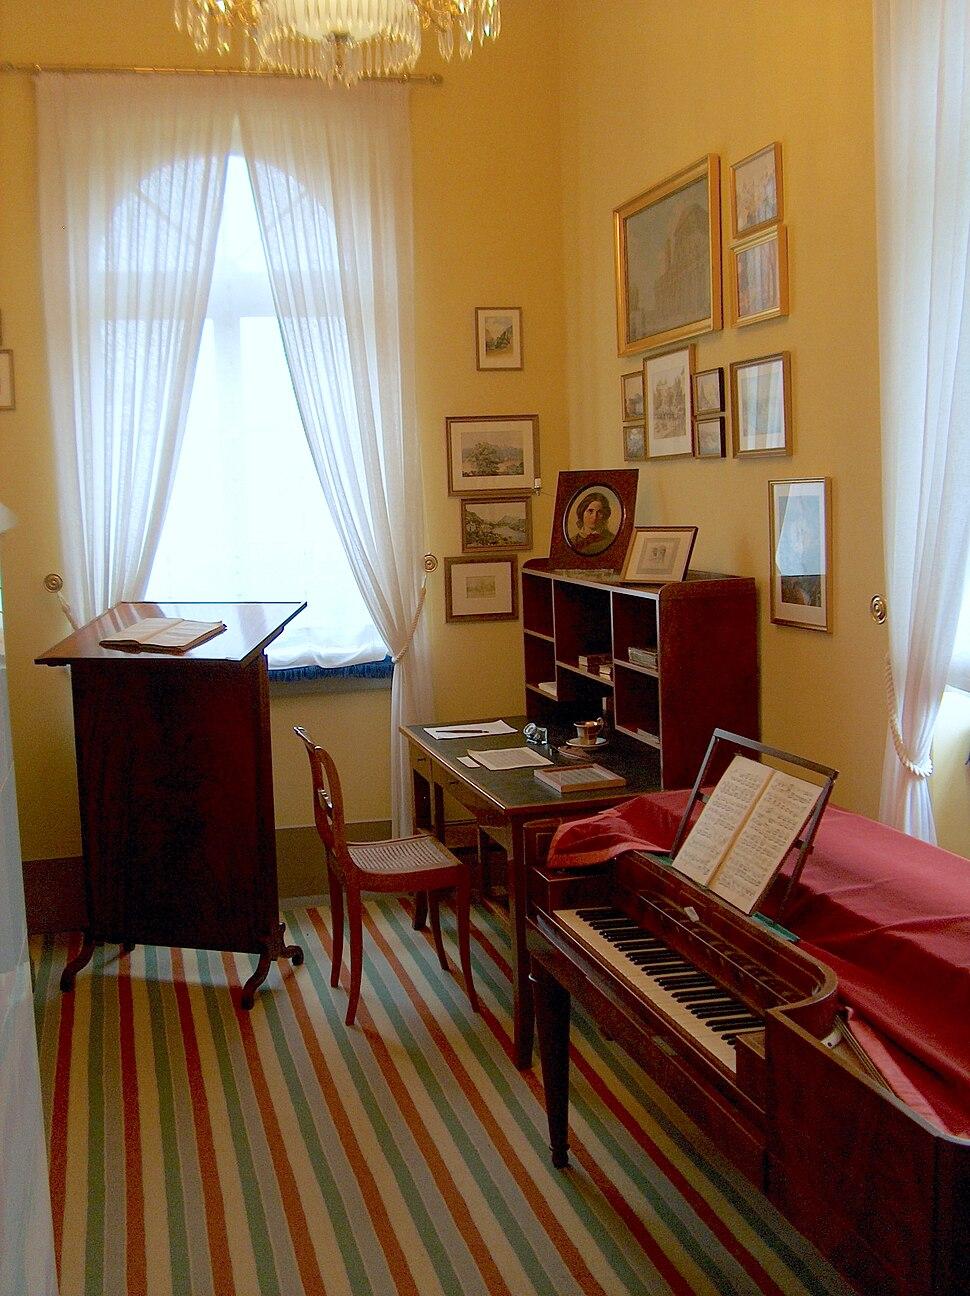 Felix Mendelssohn Leipzig study; Contemporary view